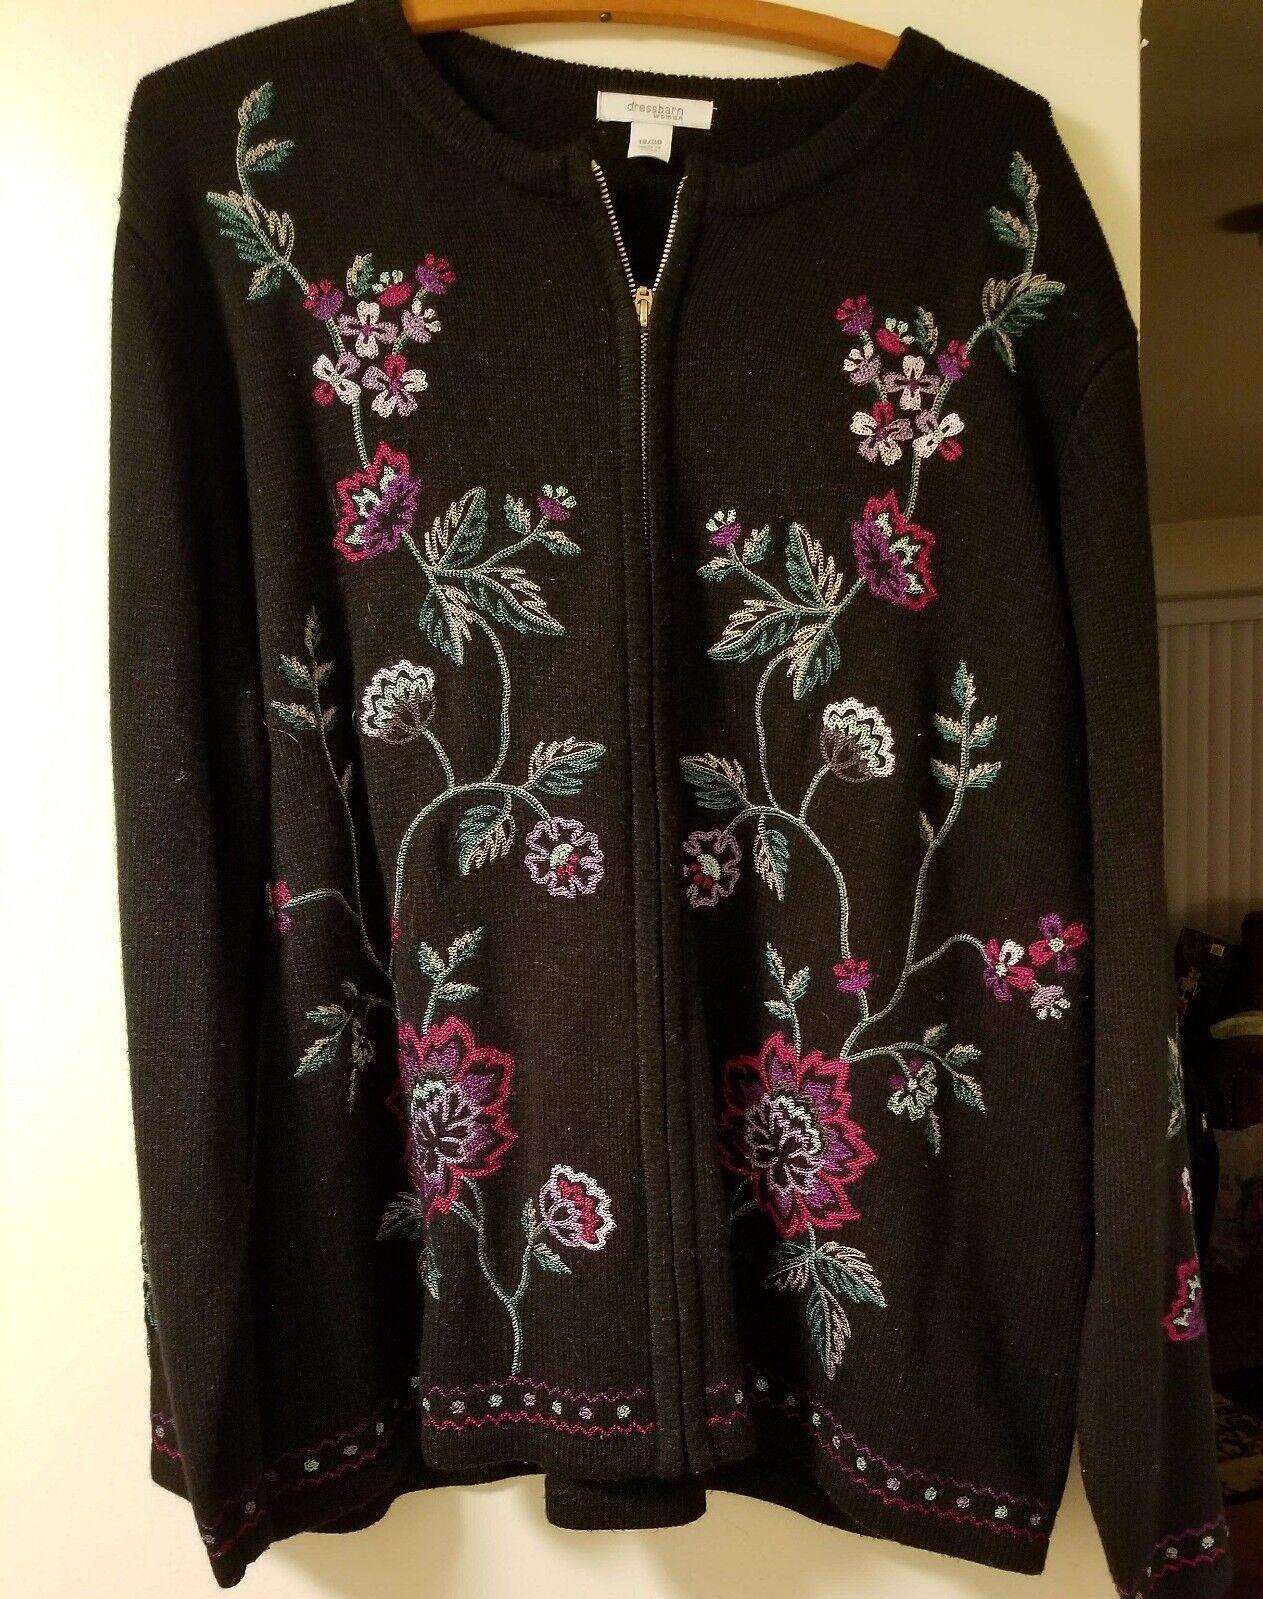 2 size 18W zippered sweaters